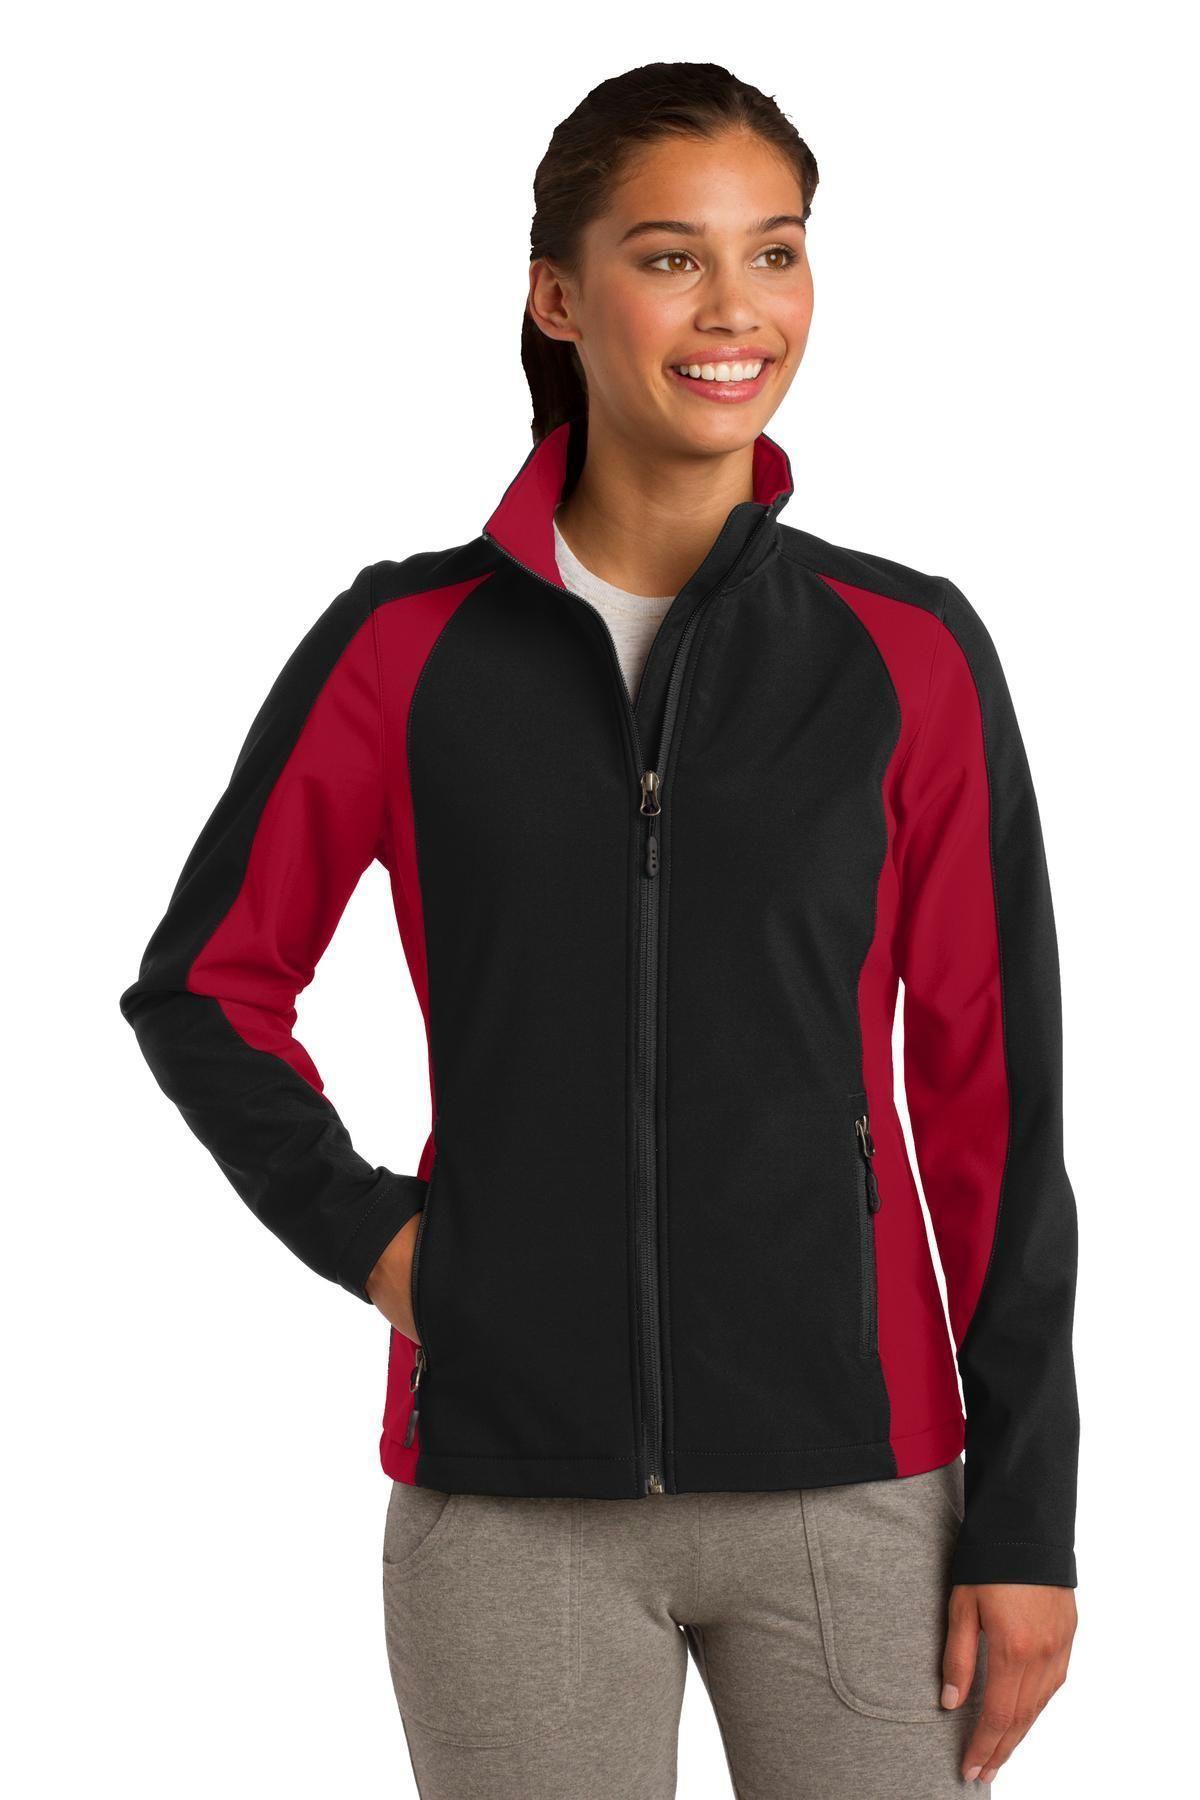 SportTek Ladies Colorblock Soft Shell Jacket. LST970